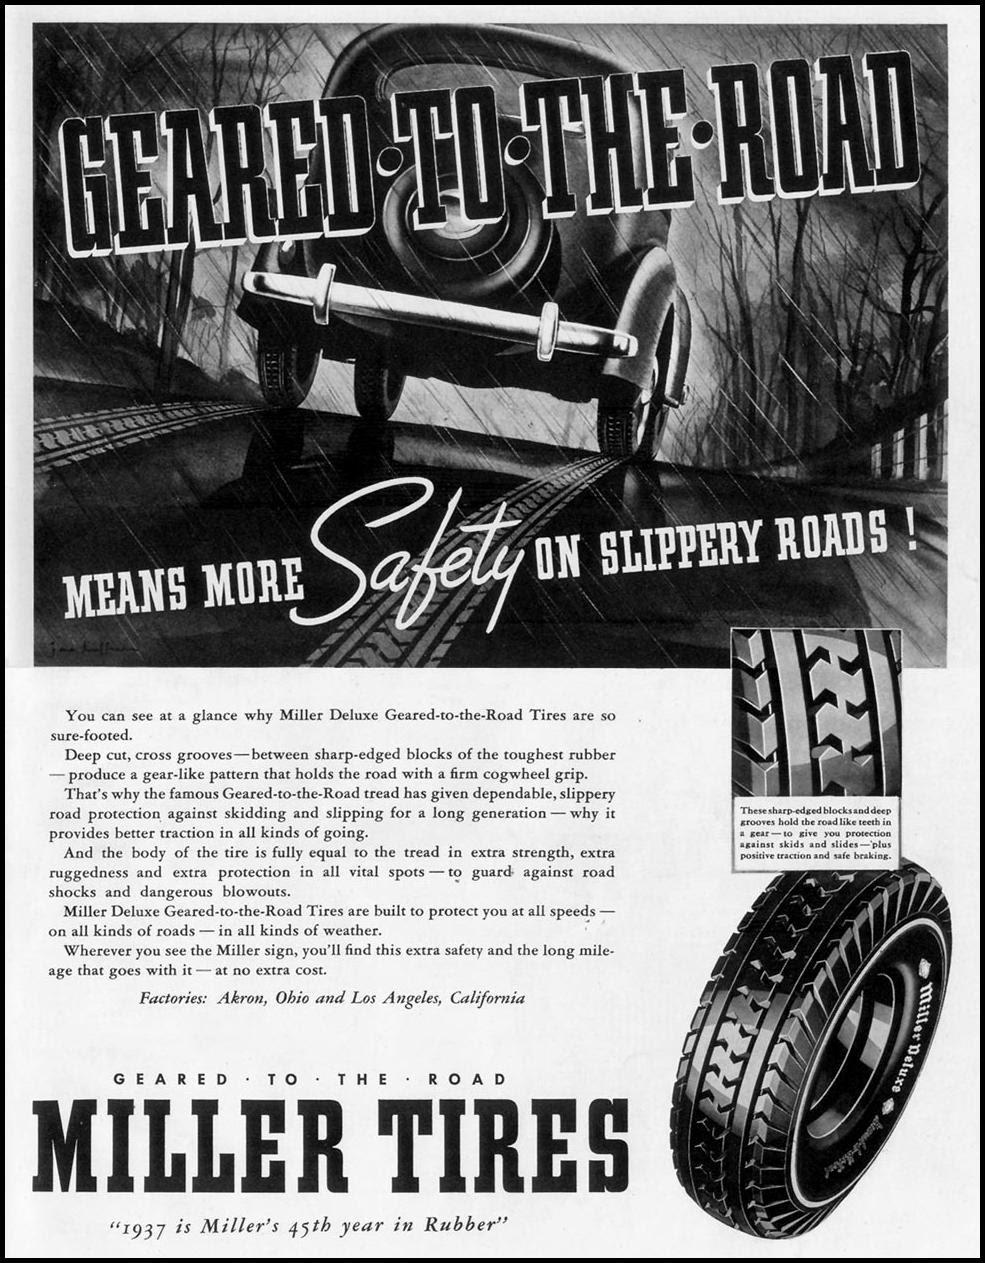 MILLER TIRES LIFE 10/04/1937 p. 1